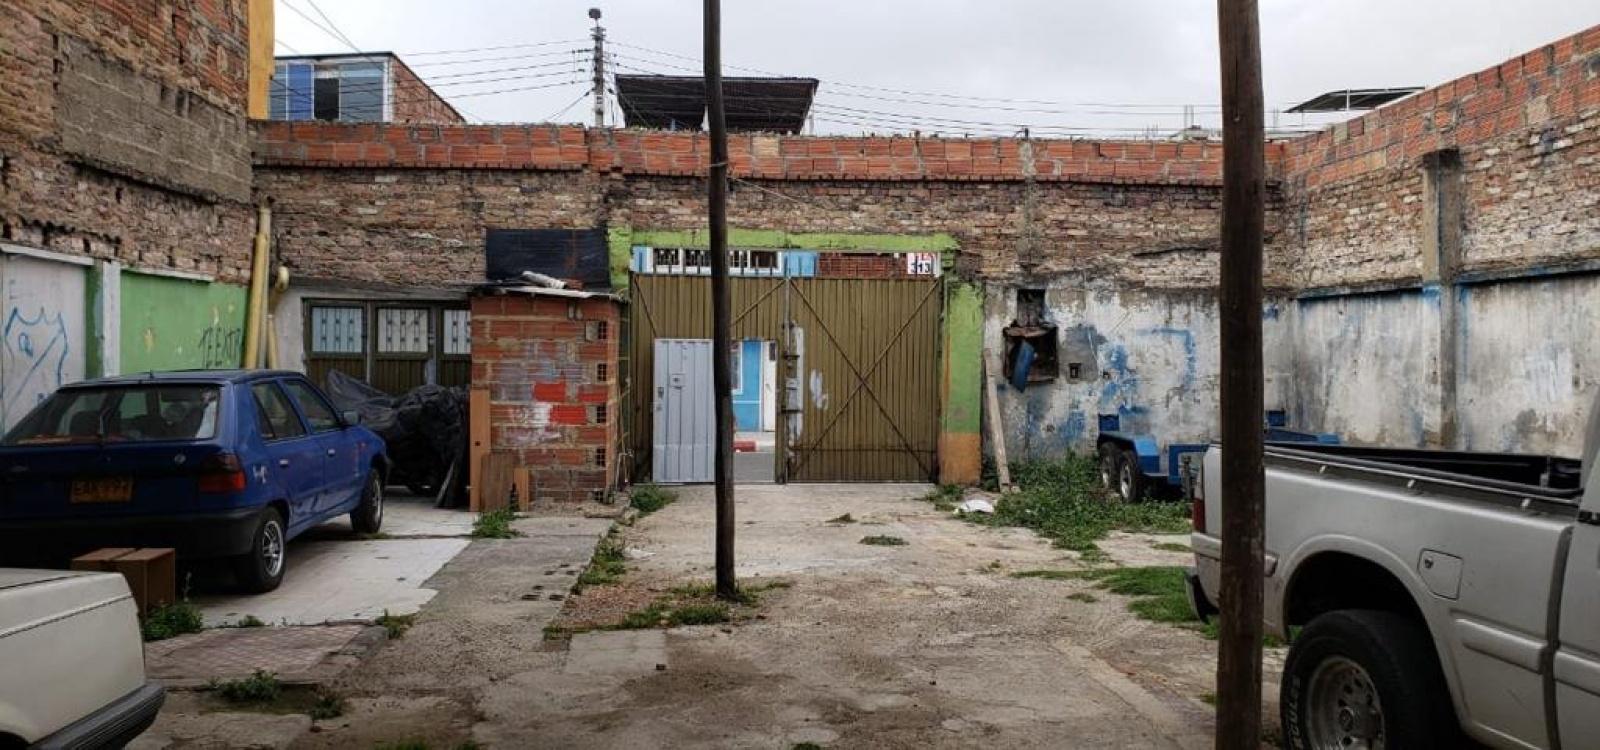 51 A 40 SUR 12,Bogotá,Sur,Tunjuelito,1 BañoLavabos,Lotes,12,1694